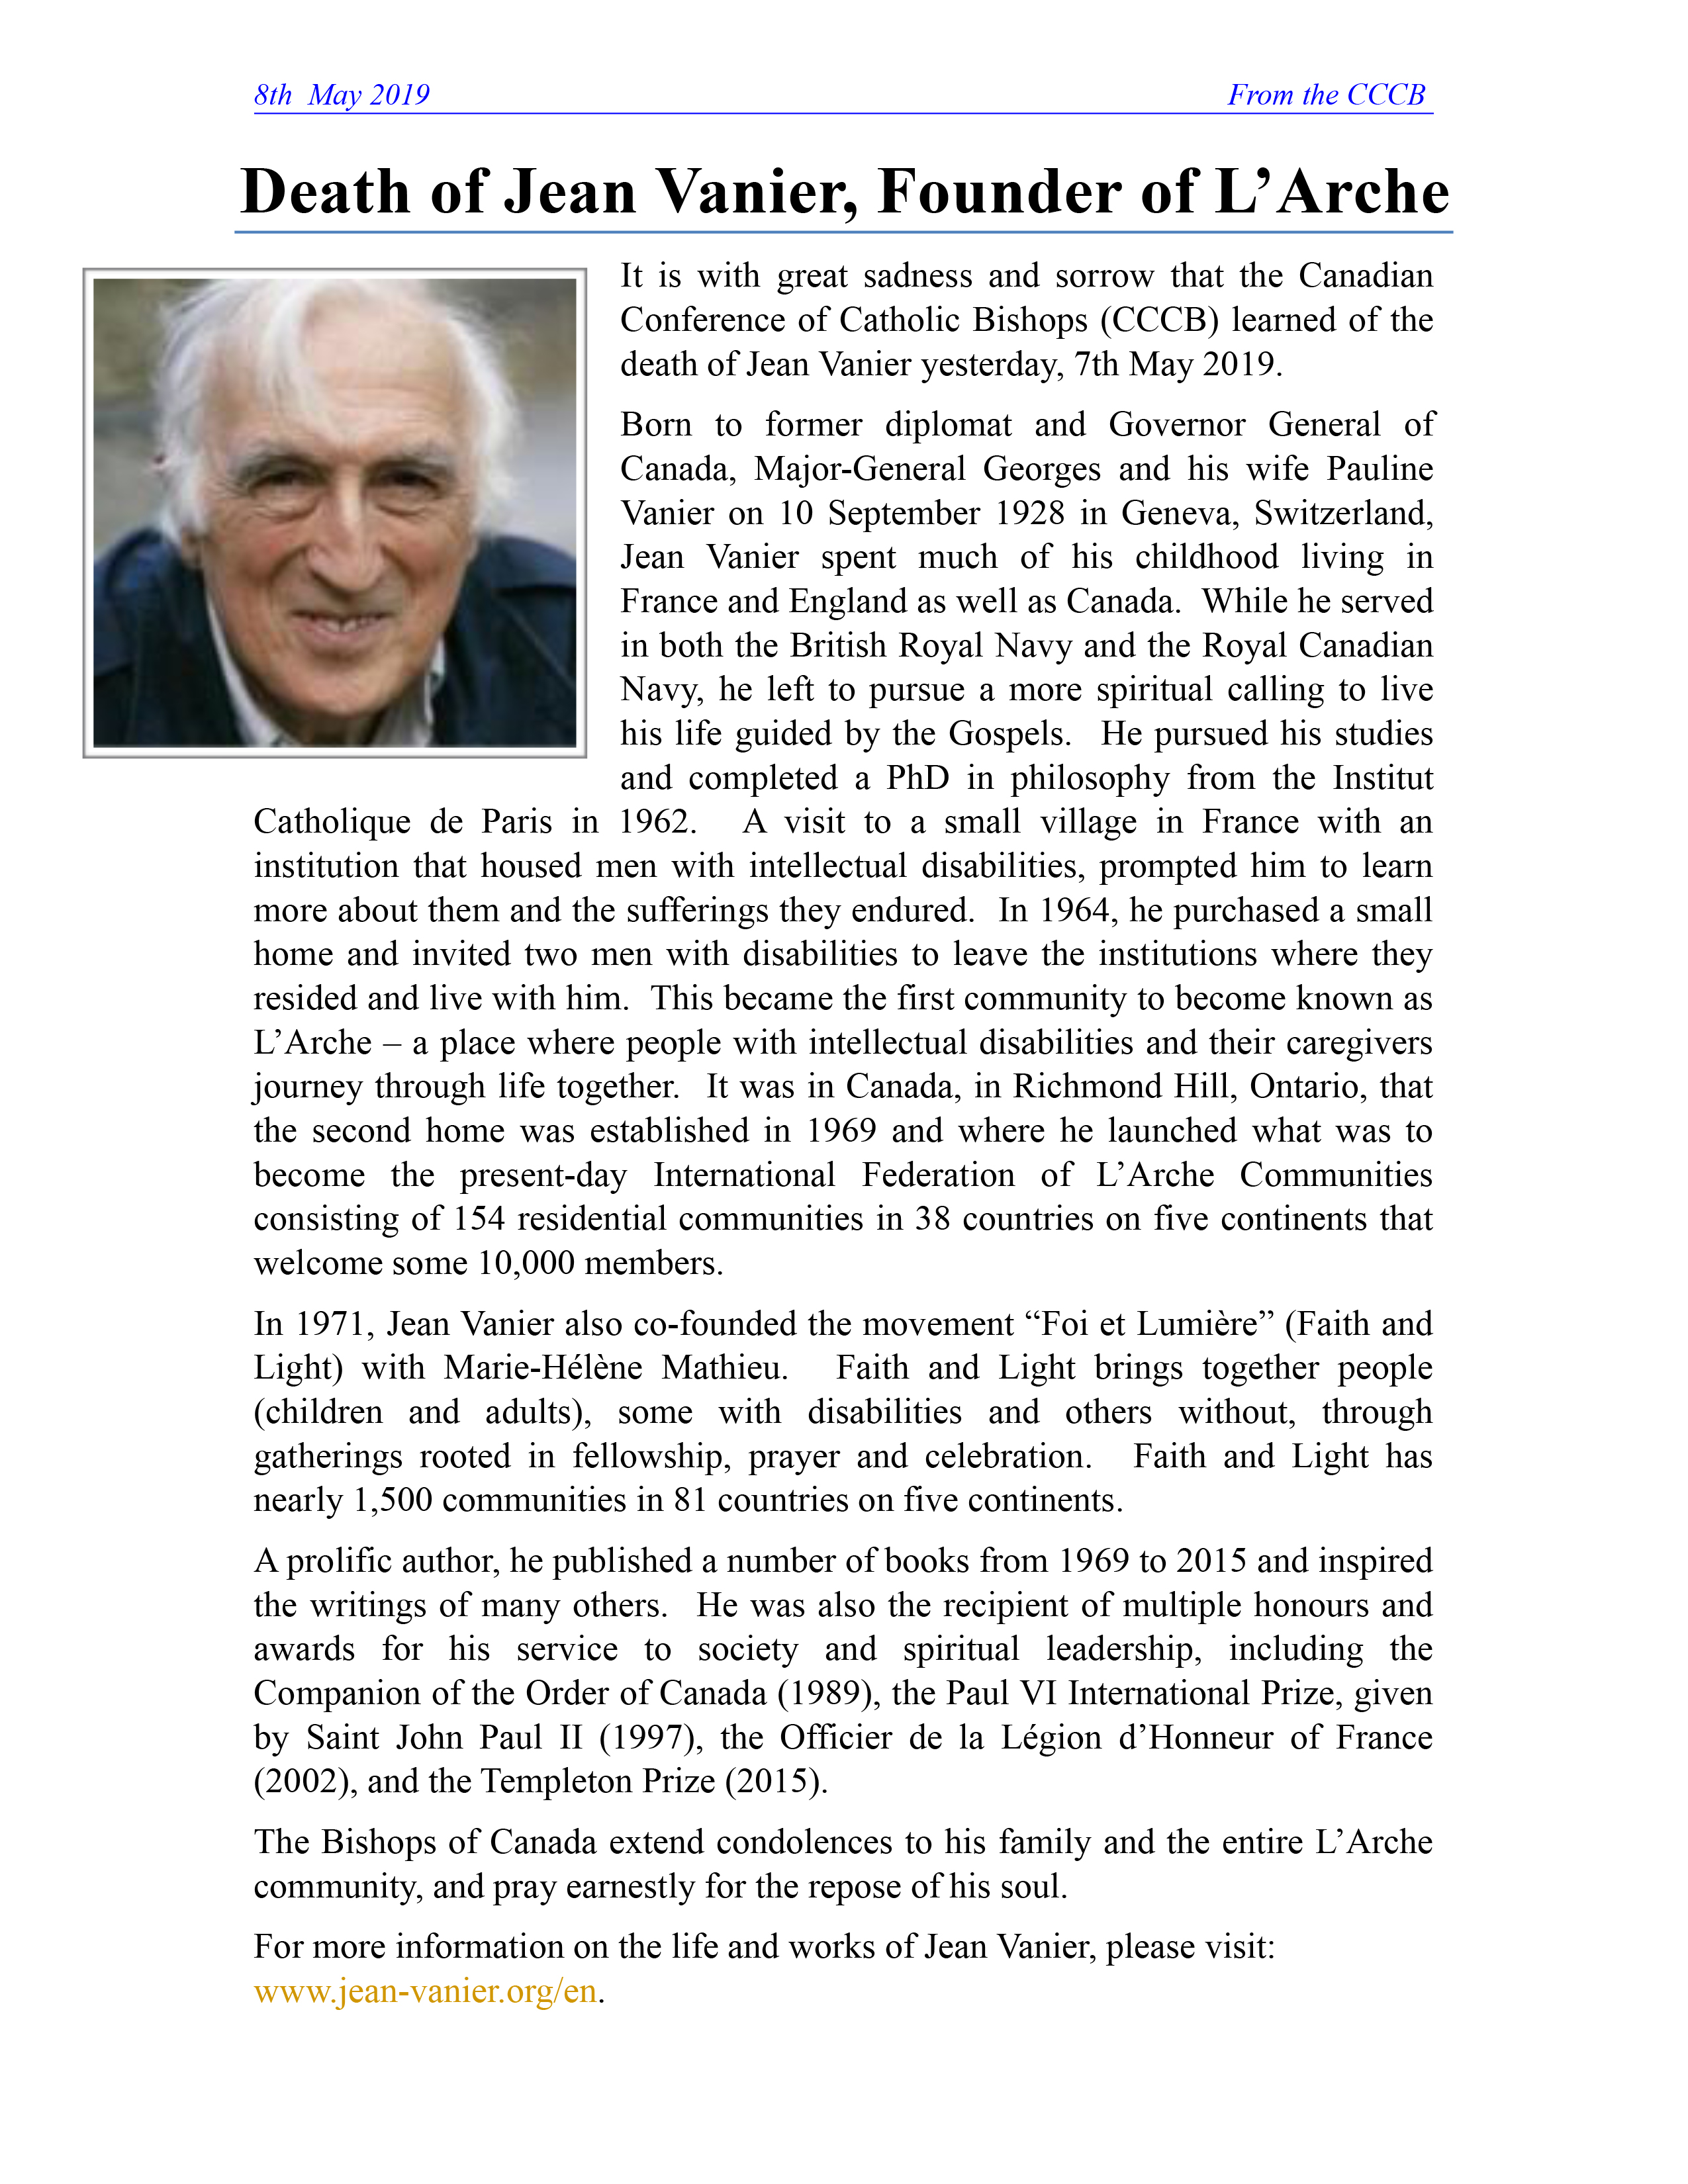 Death Of Jean Vanier